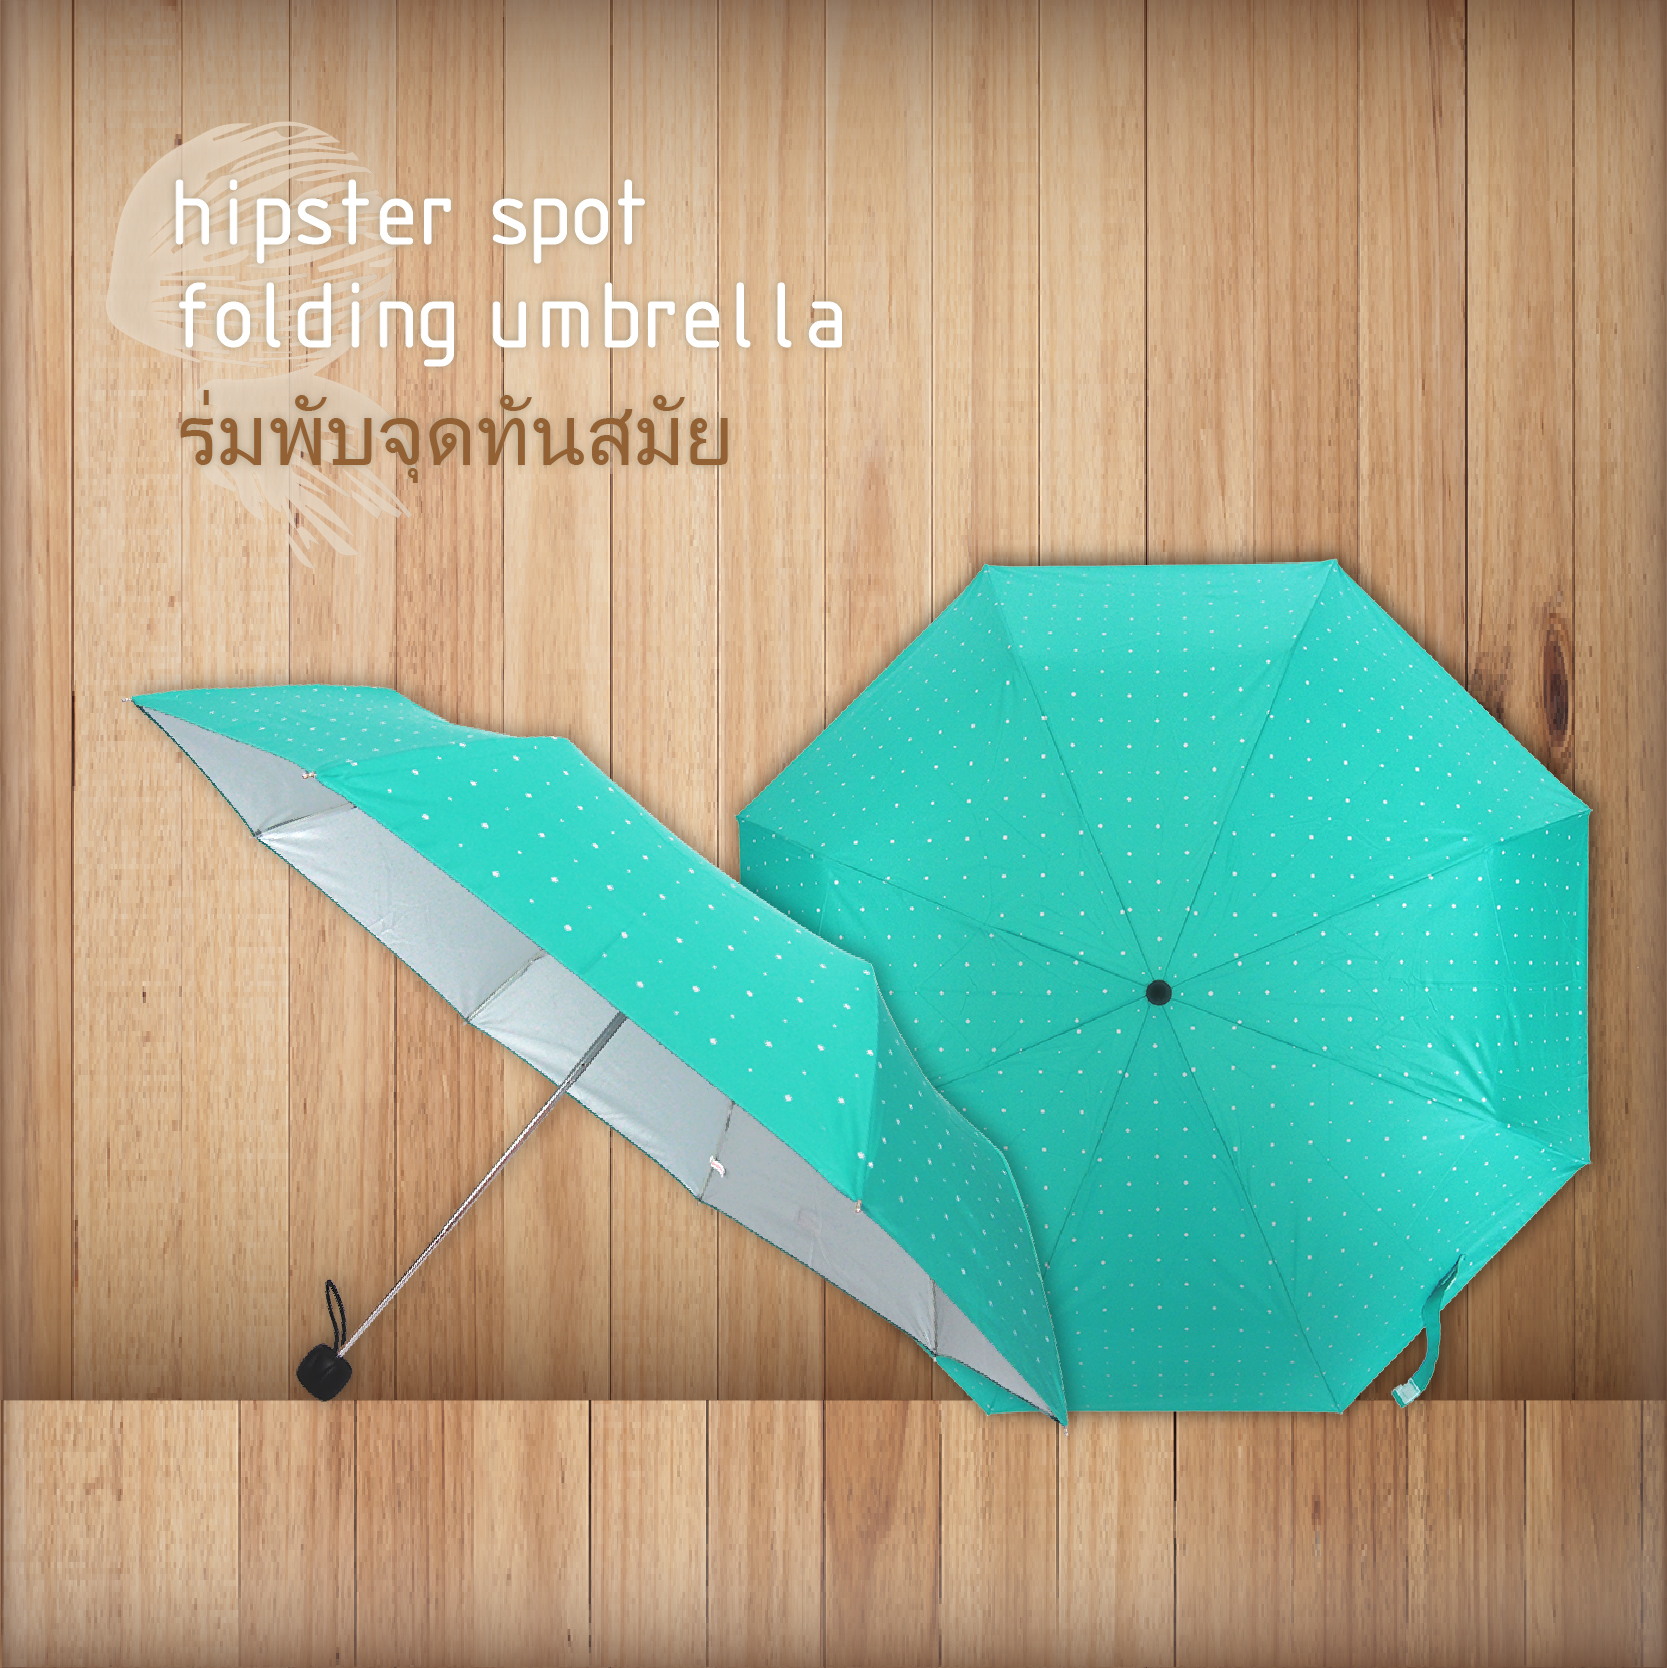 Hipster UV Folding Umbrella ร่มพับ 3ตอน เคลือบเงิน กันแดด กันยูวี กันฝน ทันสมัย-เขียว